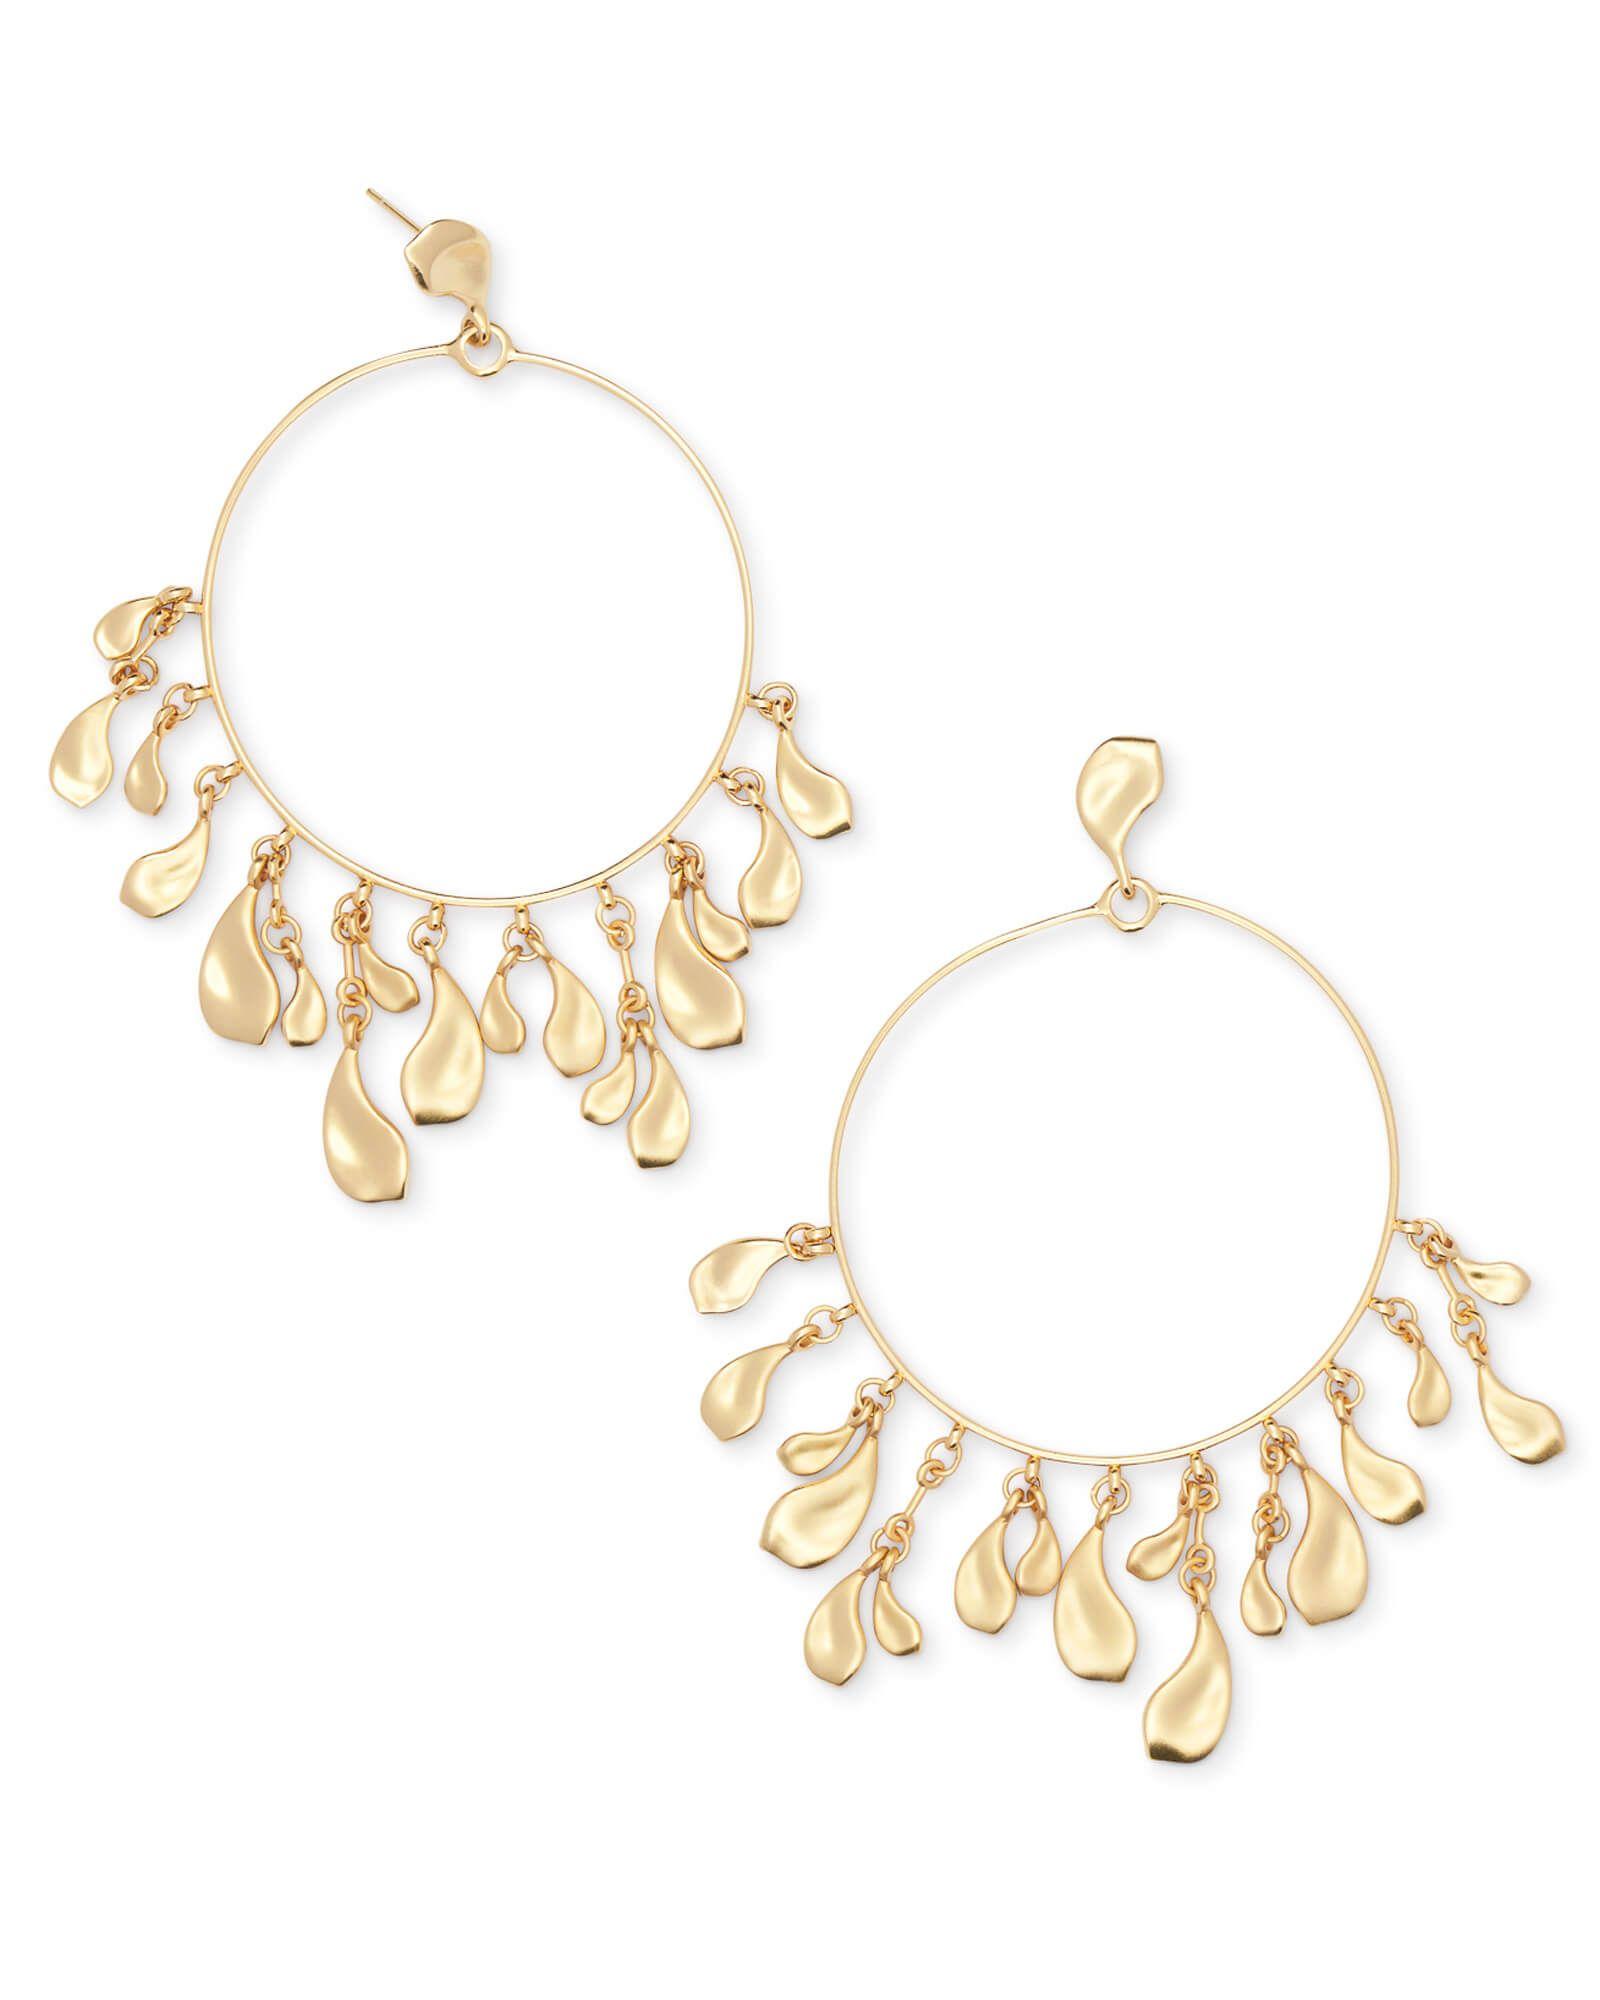 Shop natasha hoop earrings in gold at kendra scott featuring